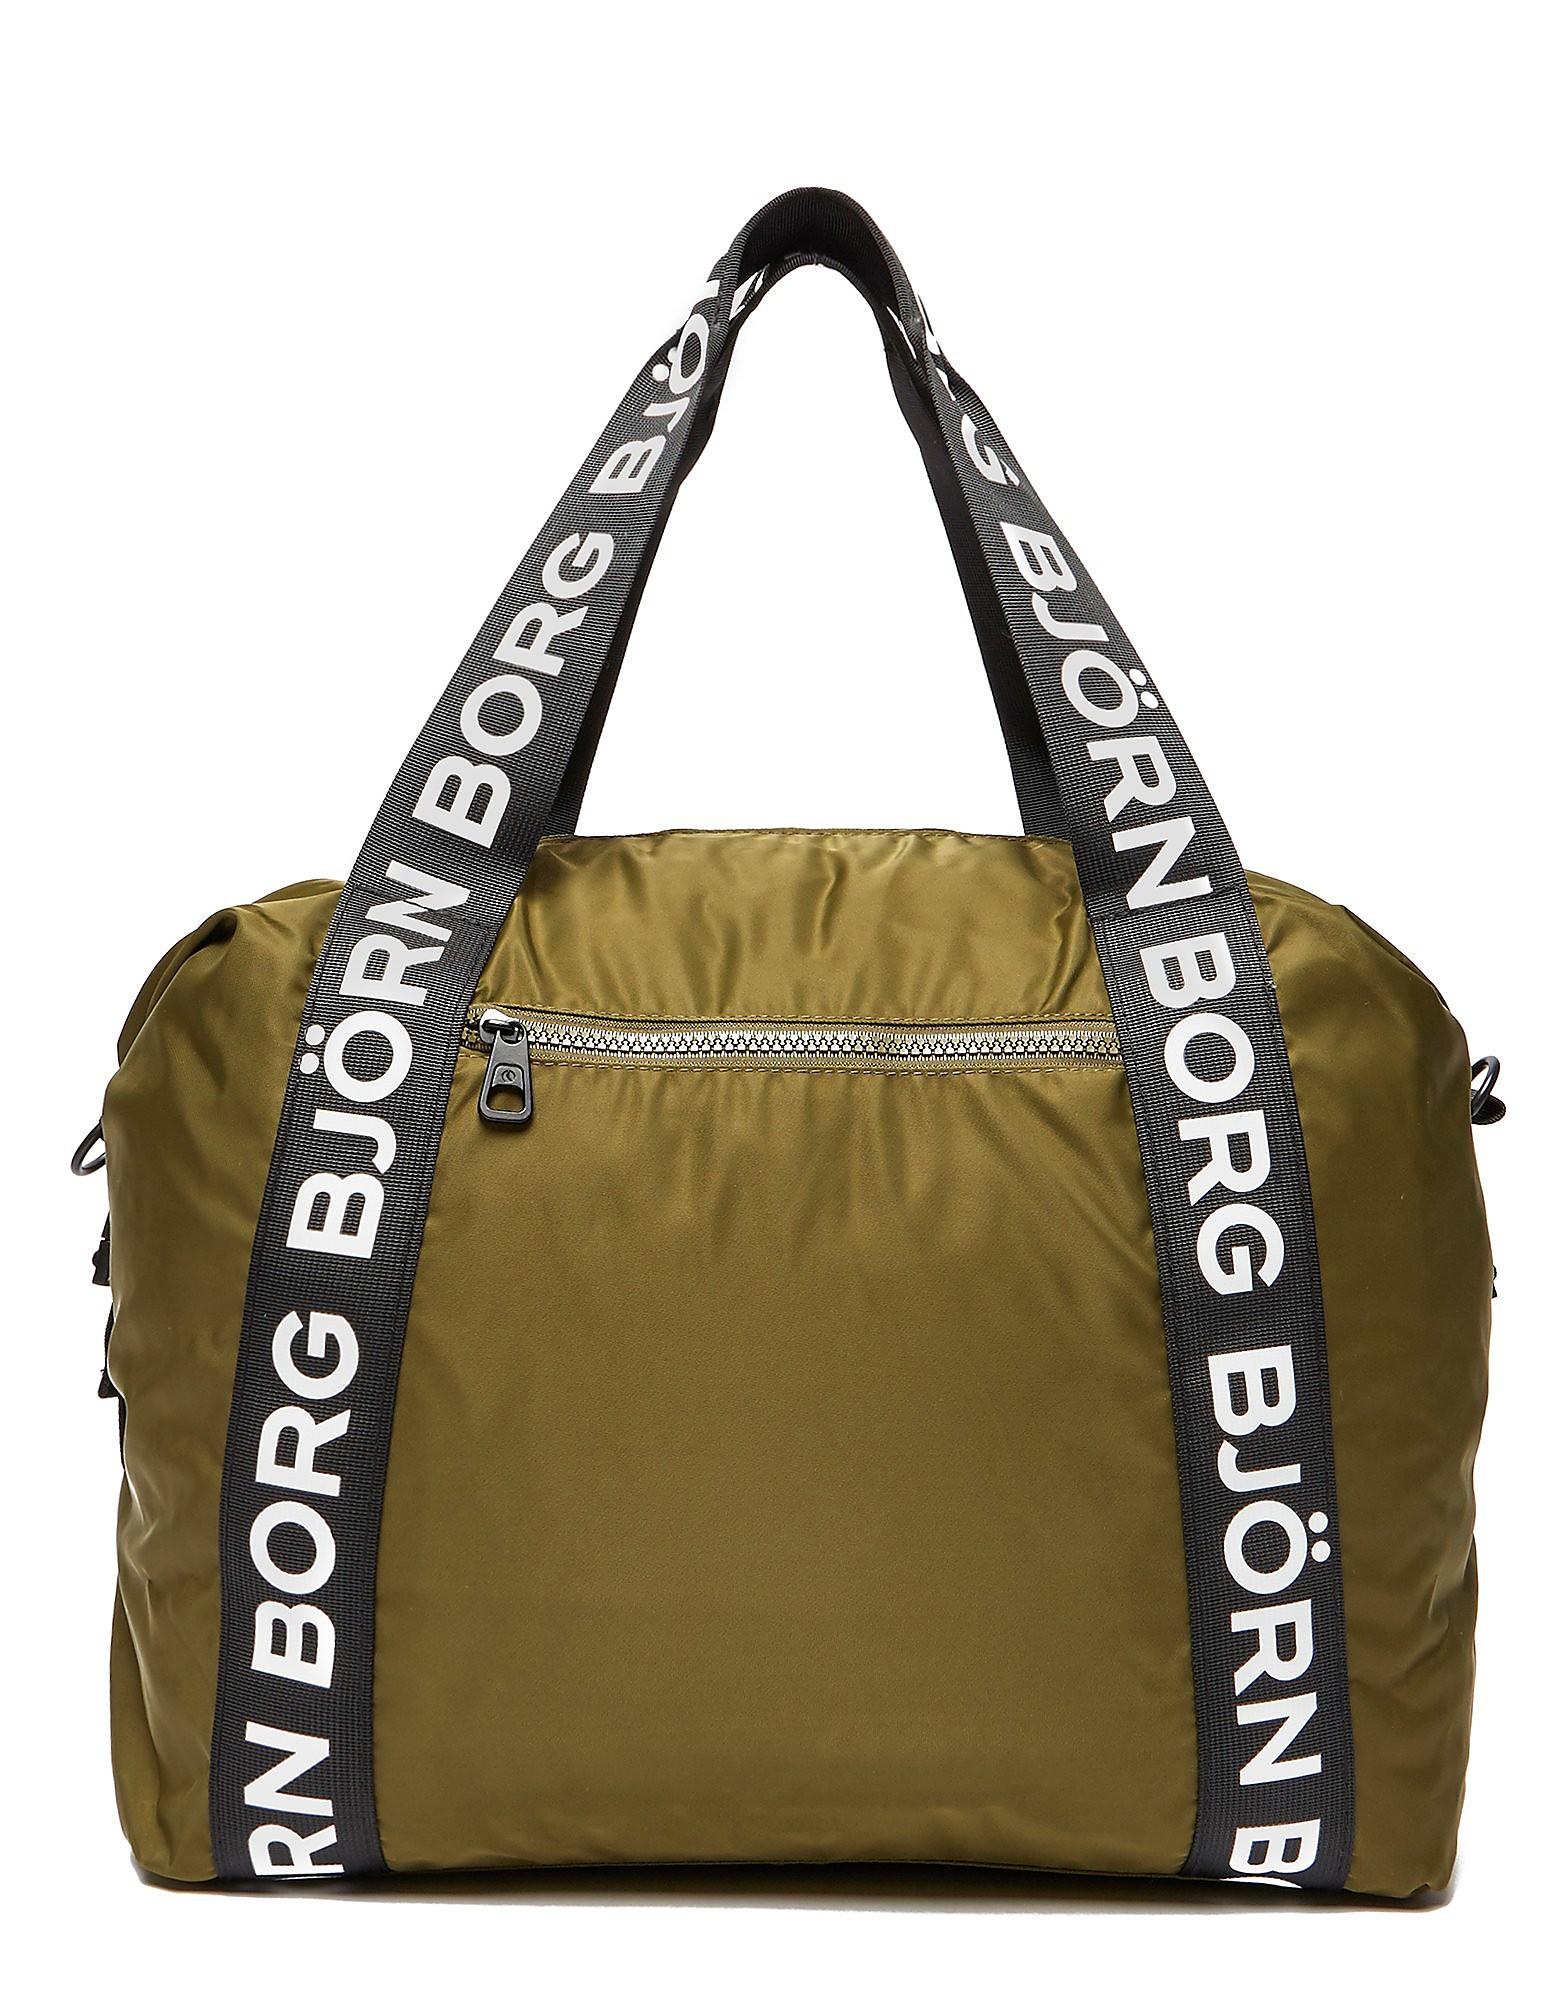 Bjorn Borg Roxy Sports Bag